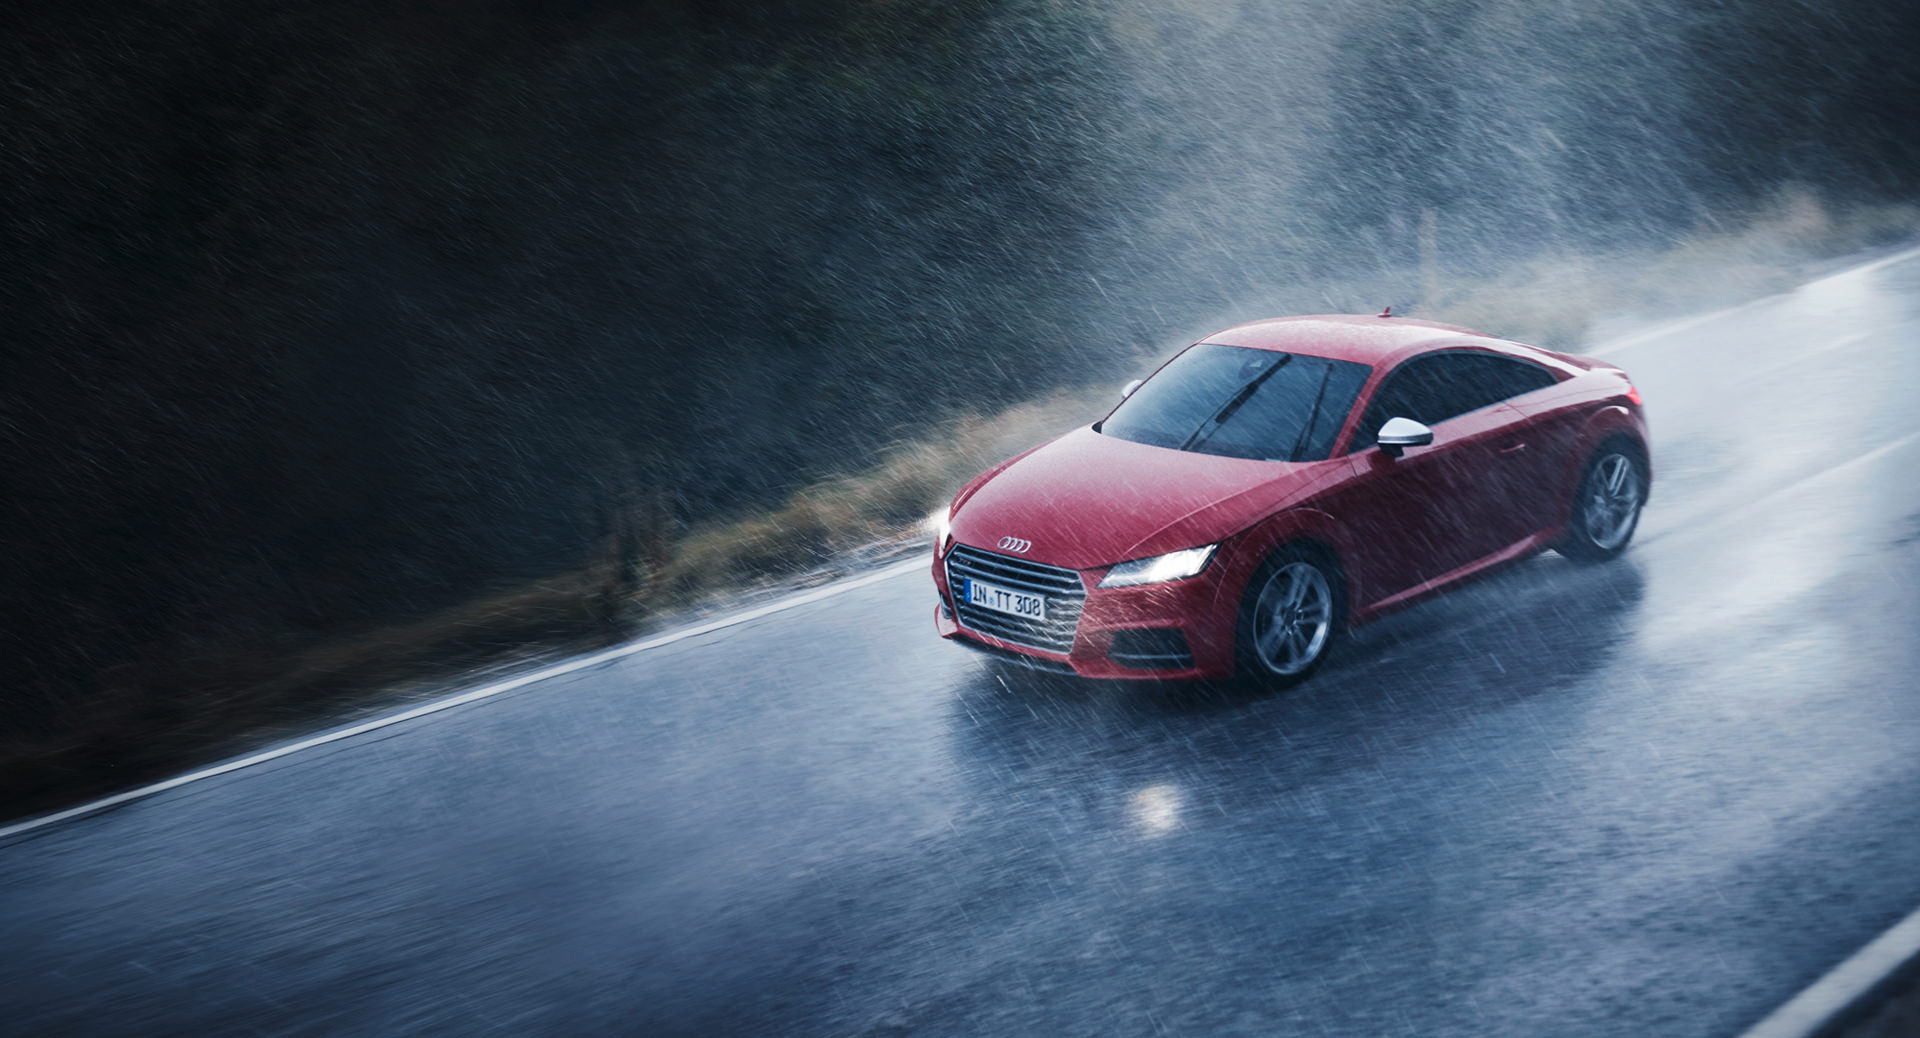 Audi Rainmaker, rain, Audi Magazin, Loved, Anke Luckmann, www.ankeluckmann.com, kai tietz, red car, rain, driving